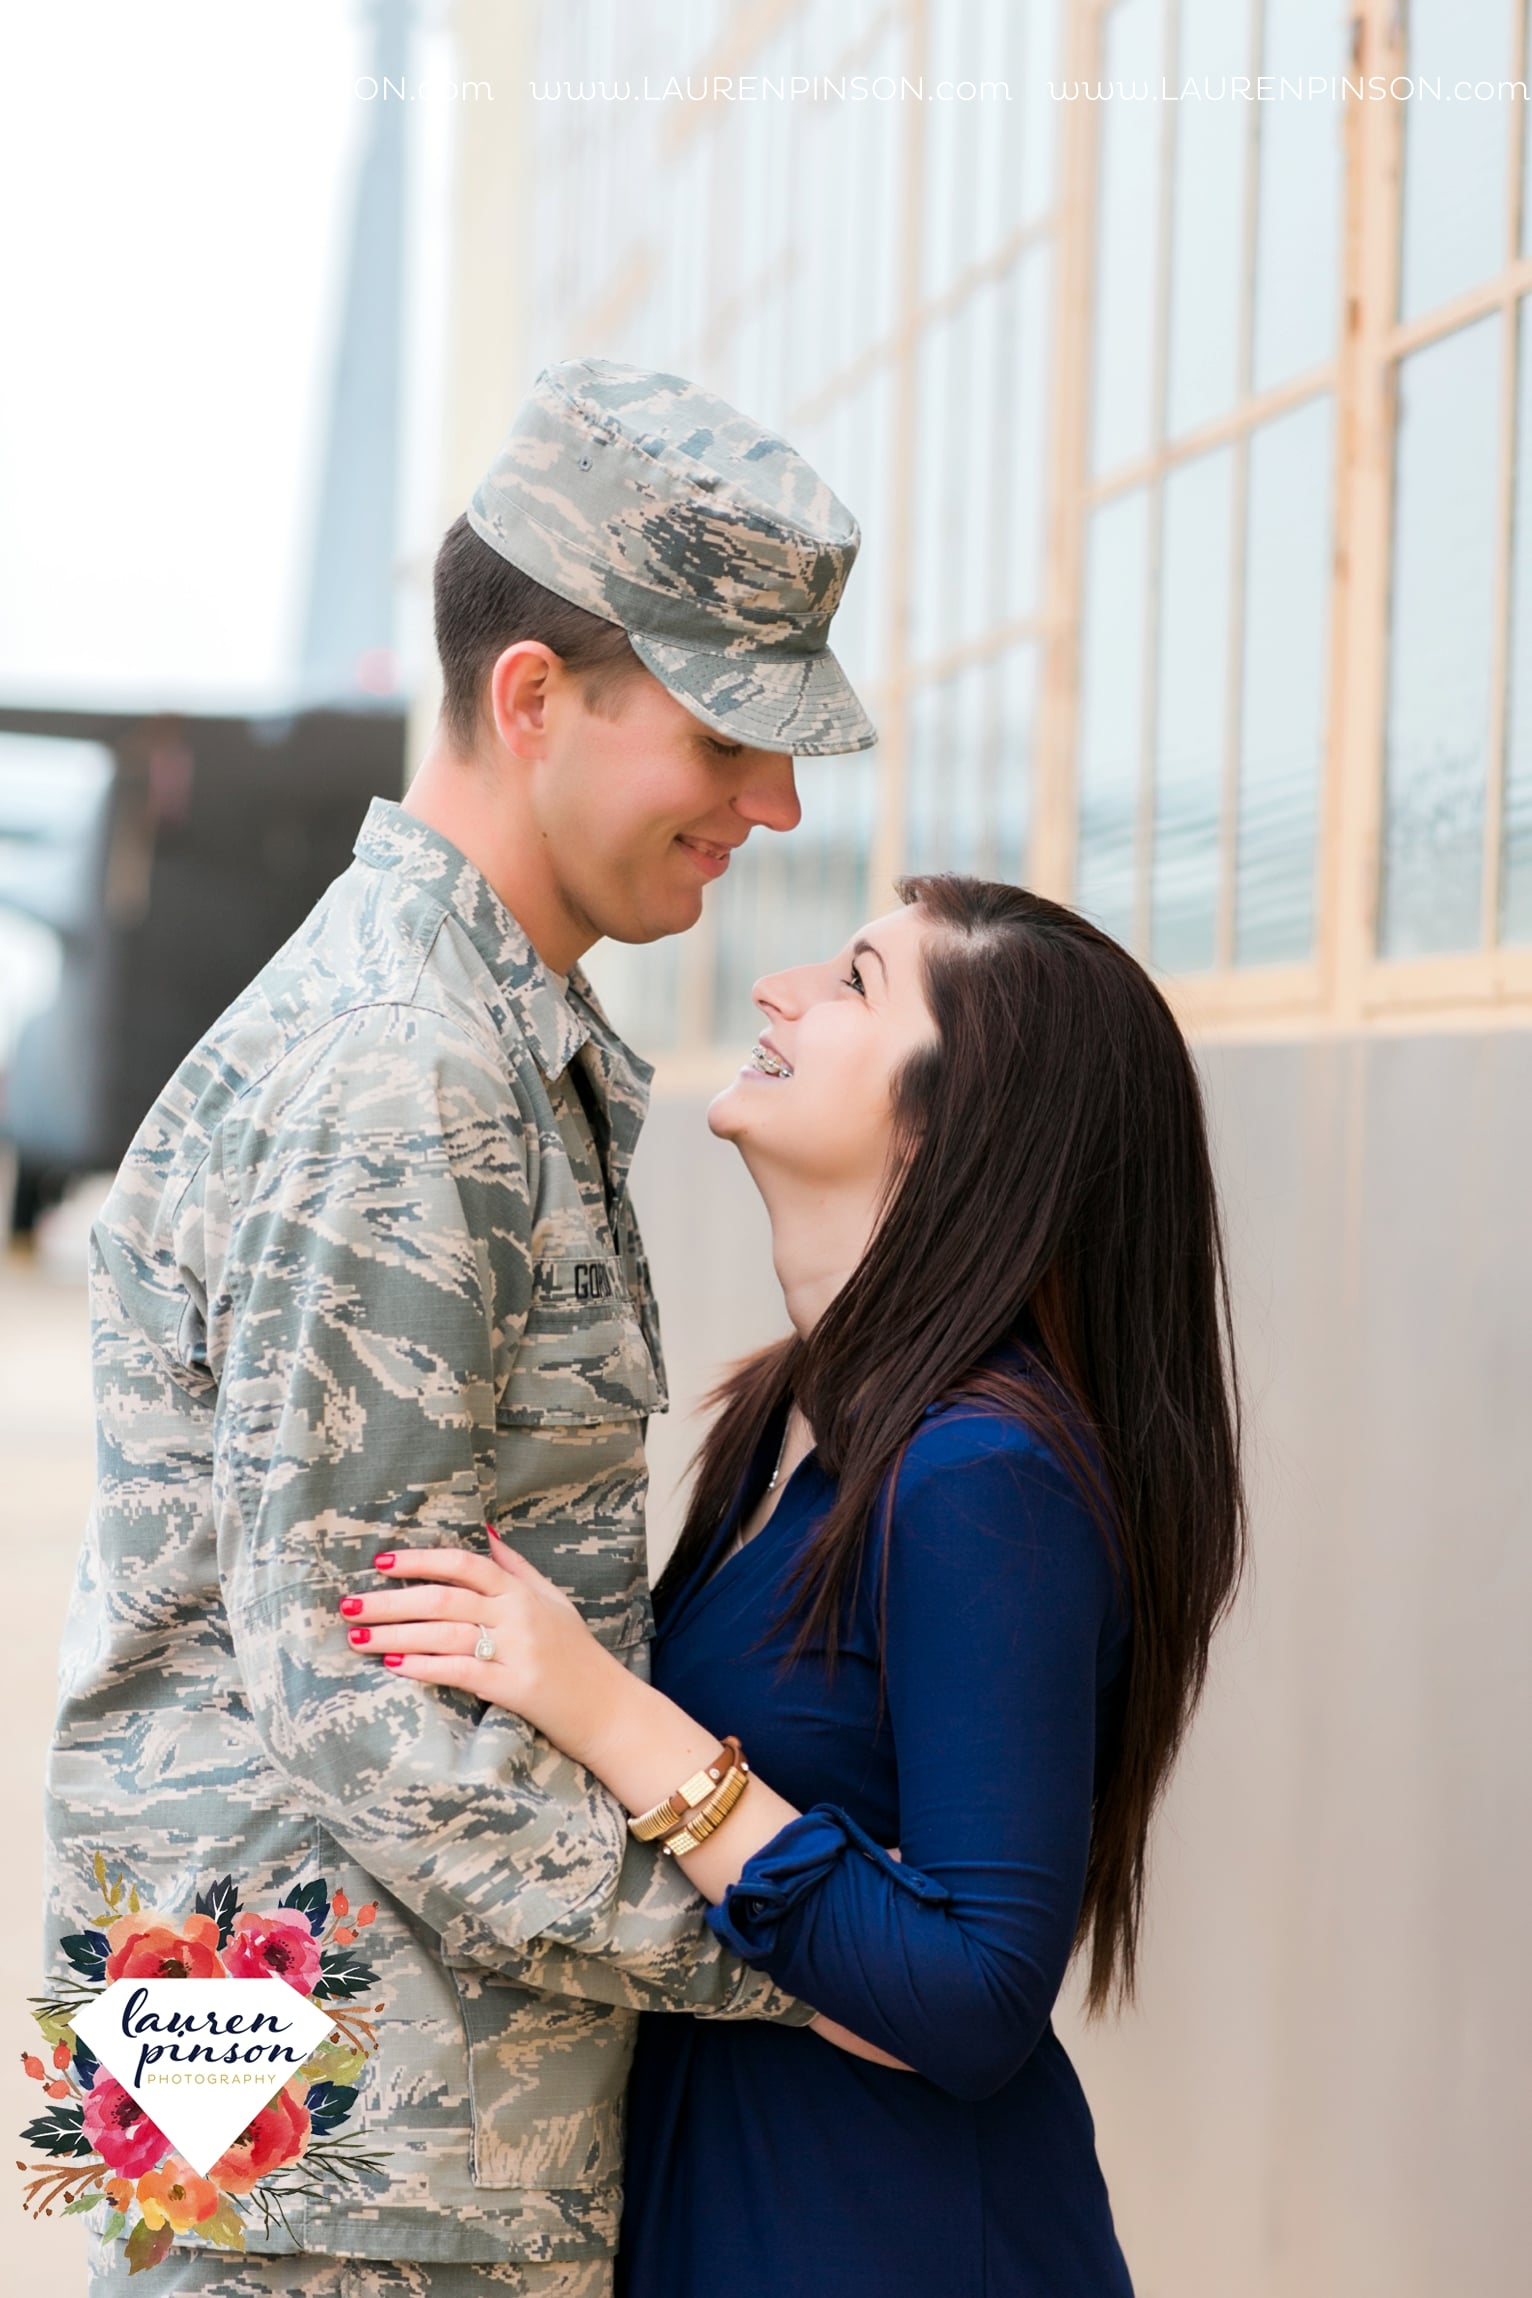 sheppard-afb-wichita-falls-engagement-session-airmen-in-uniform-abu-airplanes-bride-engagement-ring-texas-air-force-base_1998.jpg